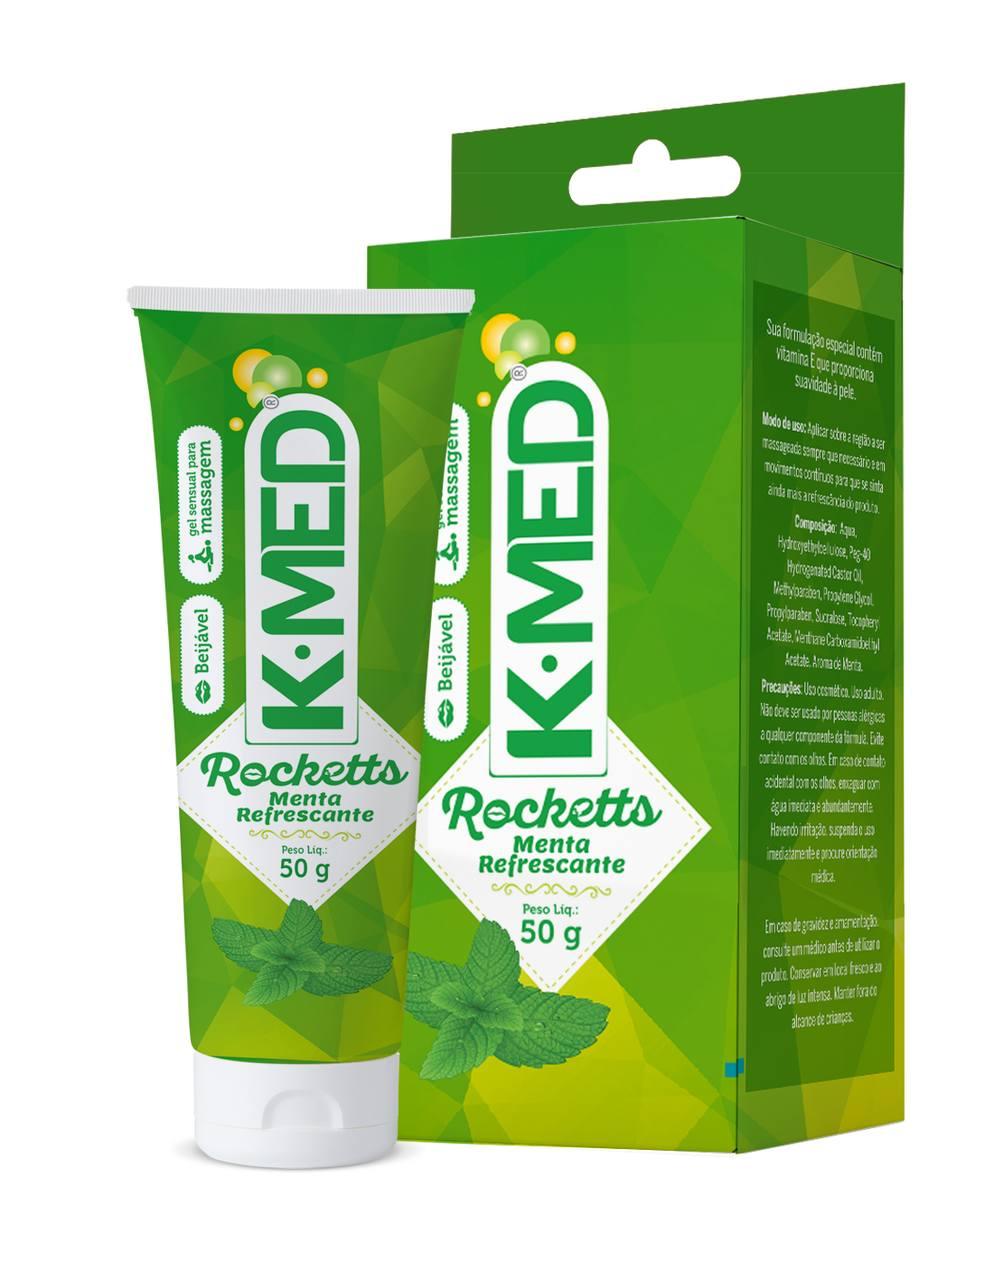 Imagem do produto K-Med Rocketts Menta Refrescante